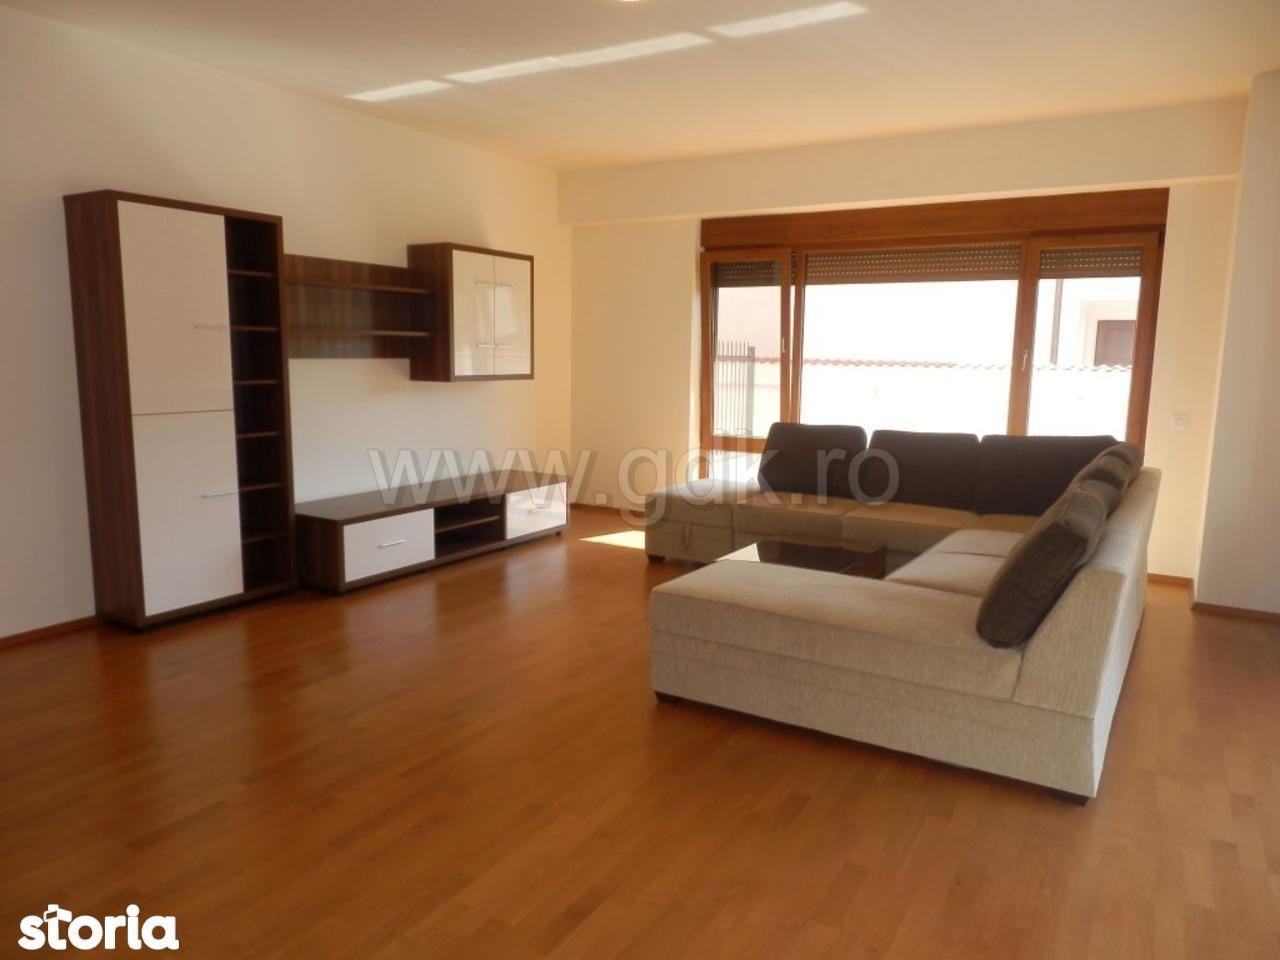 Apartament de inchiriat, București (judet), Strada Căpitan Gheorghe Calpan - Foto 1